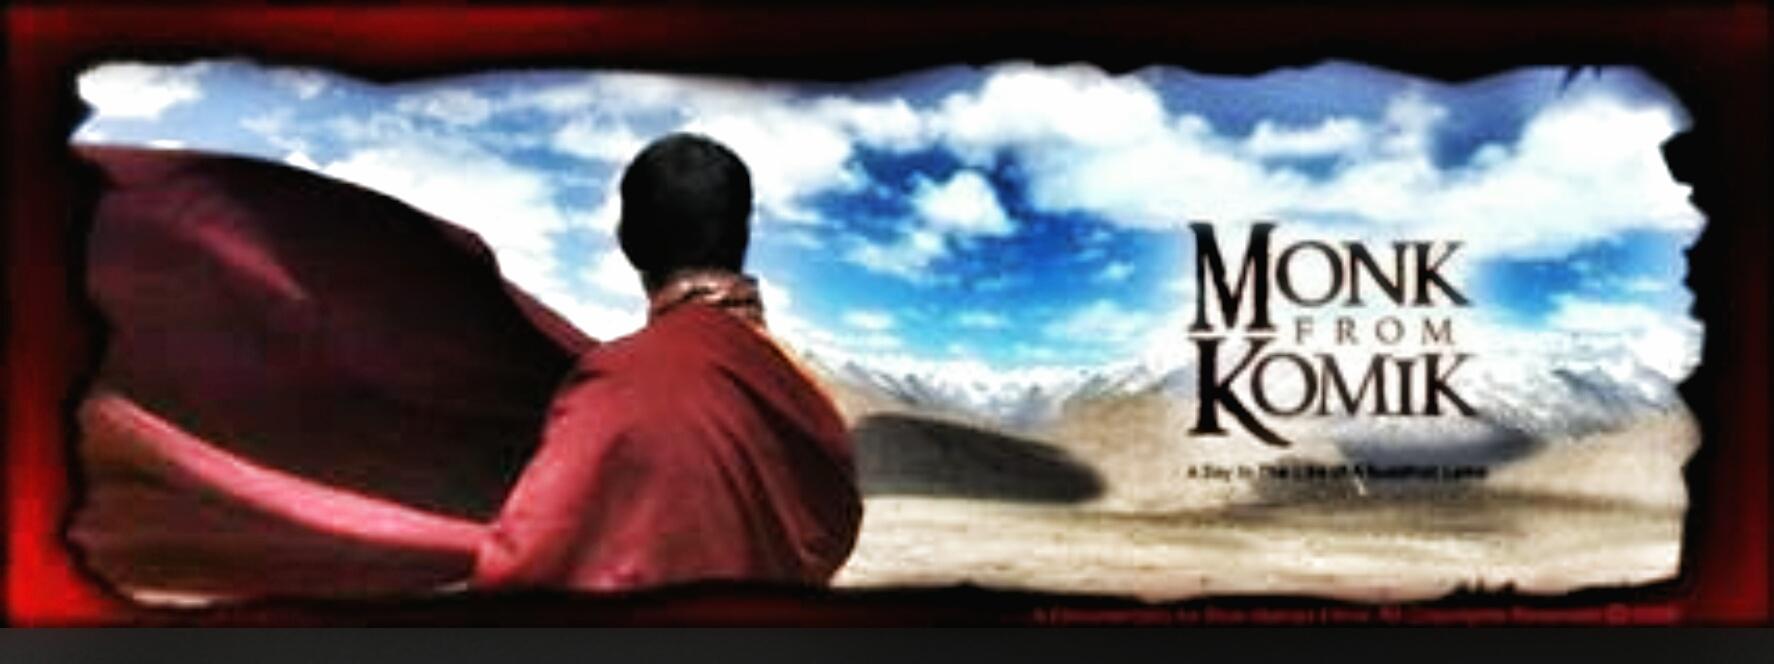 Lama Karzan, Monk from Komik, Langza, Spiti Valley, Himachal Pradesh,Himalayas, India